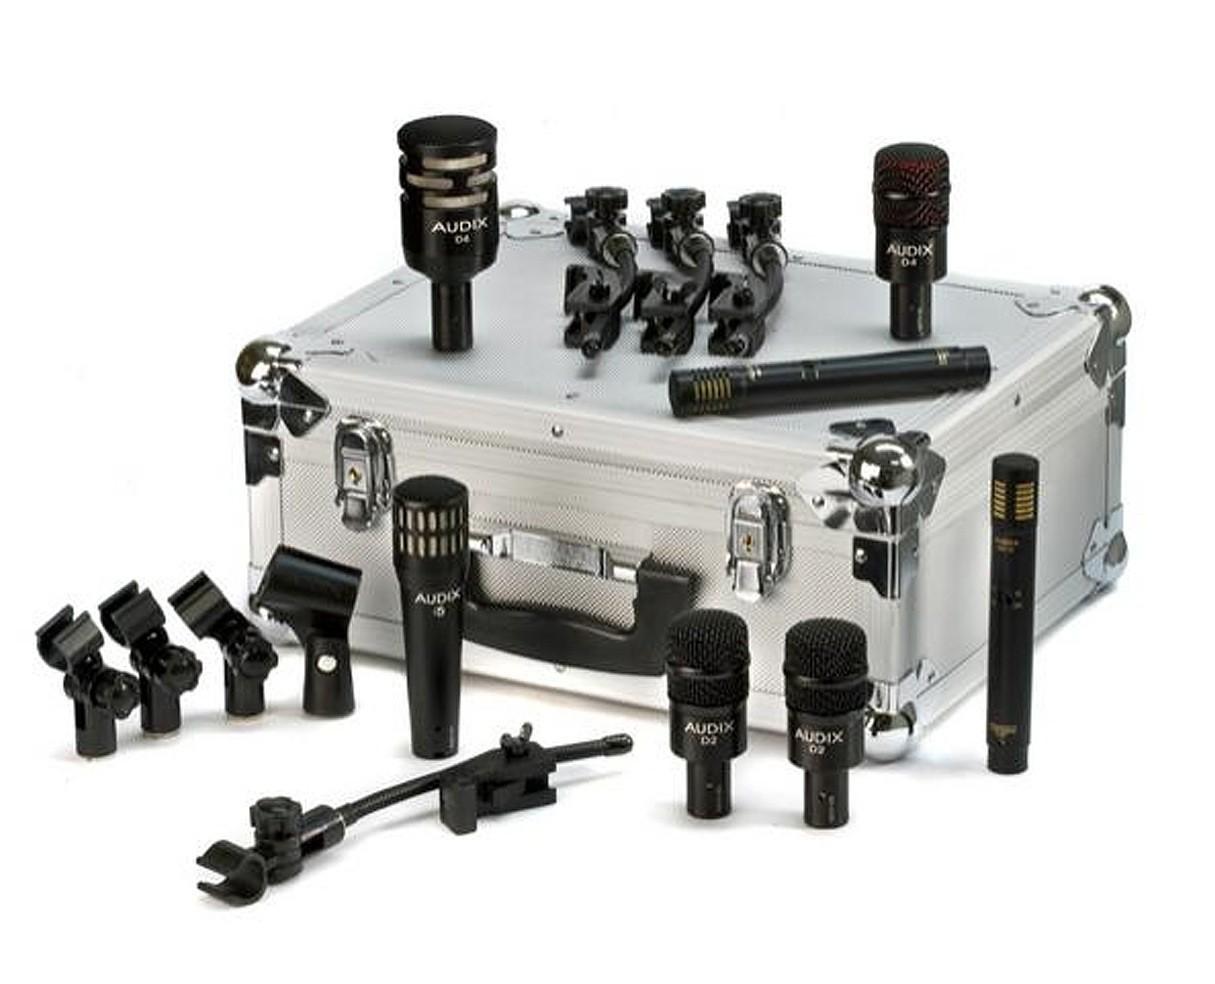 Audix DP 7 Drum Microphone Set